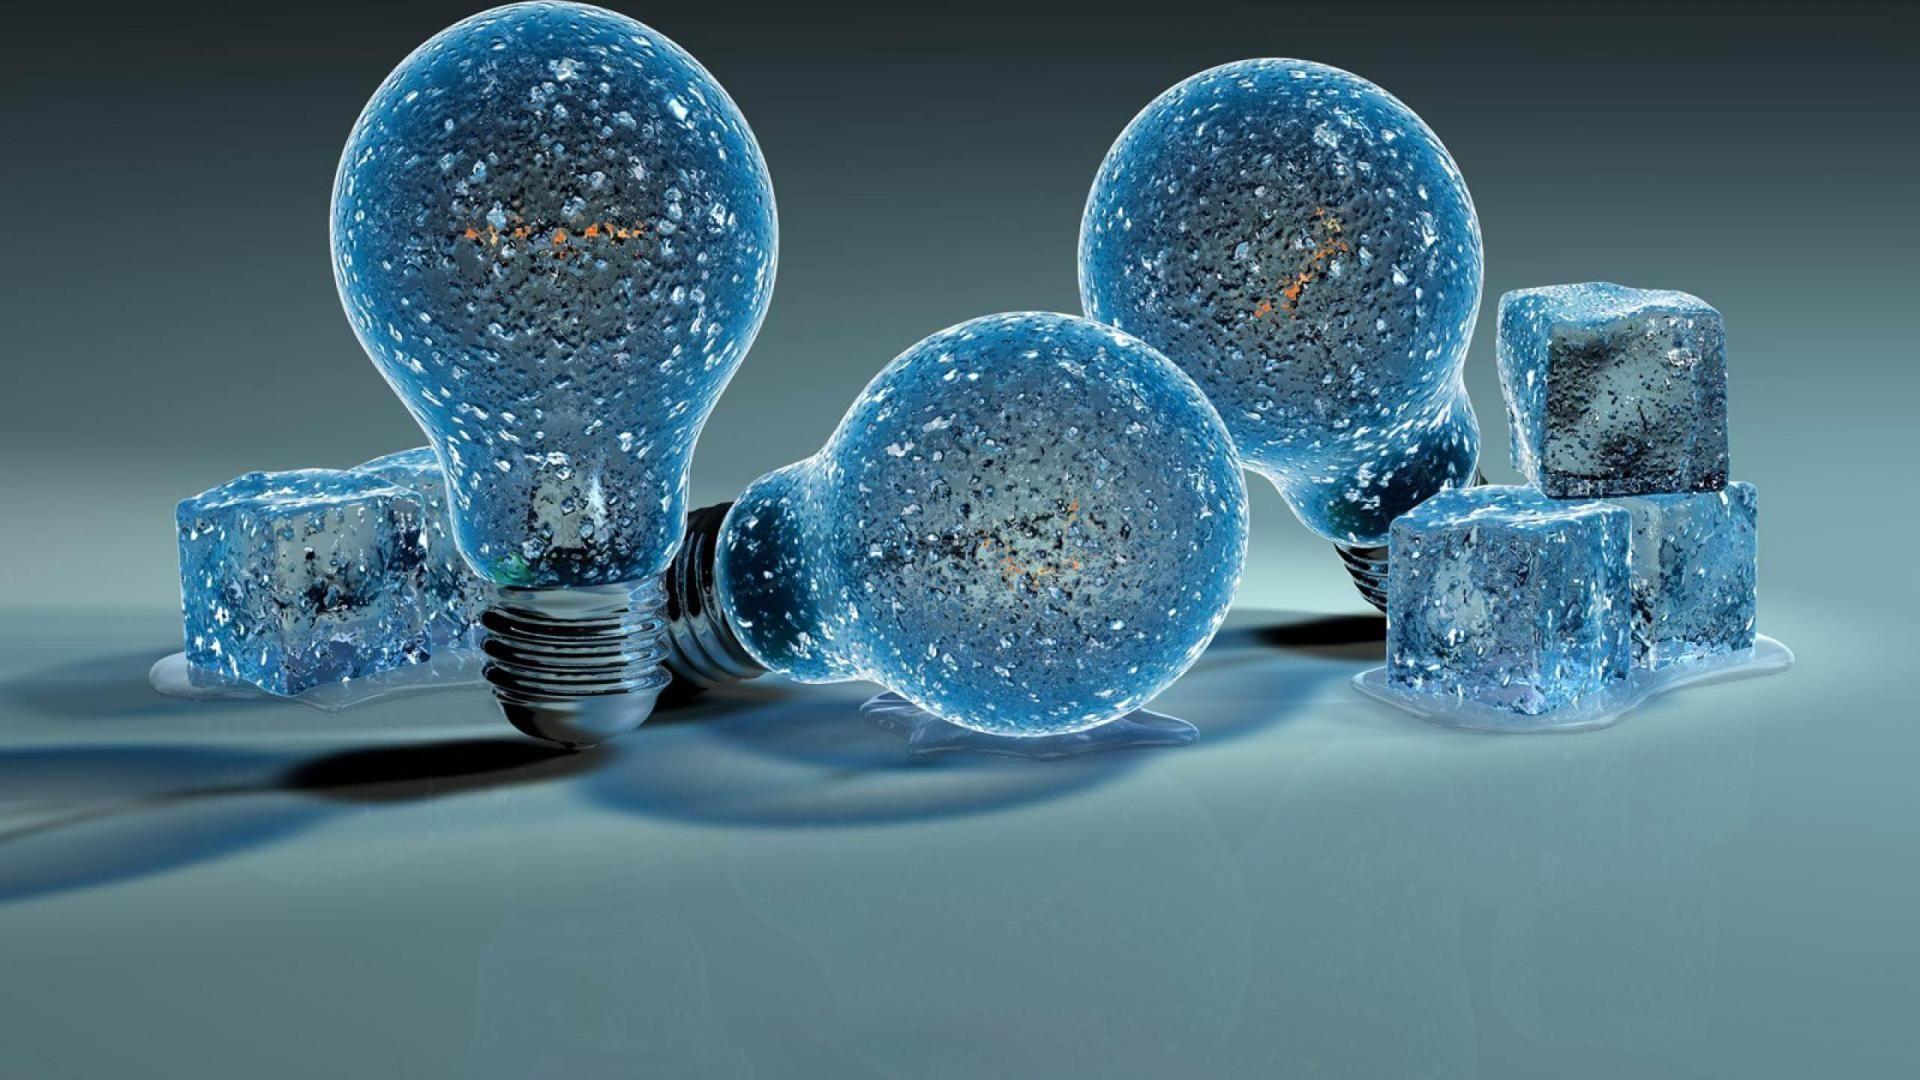 download best 3d bulb wallpapers background hd for your desktop